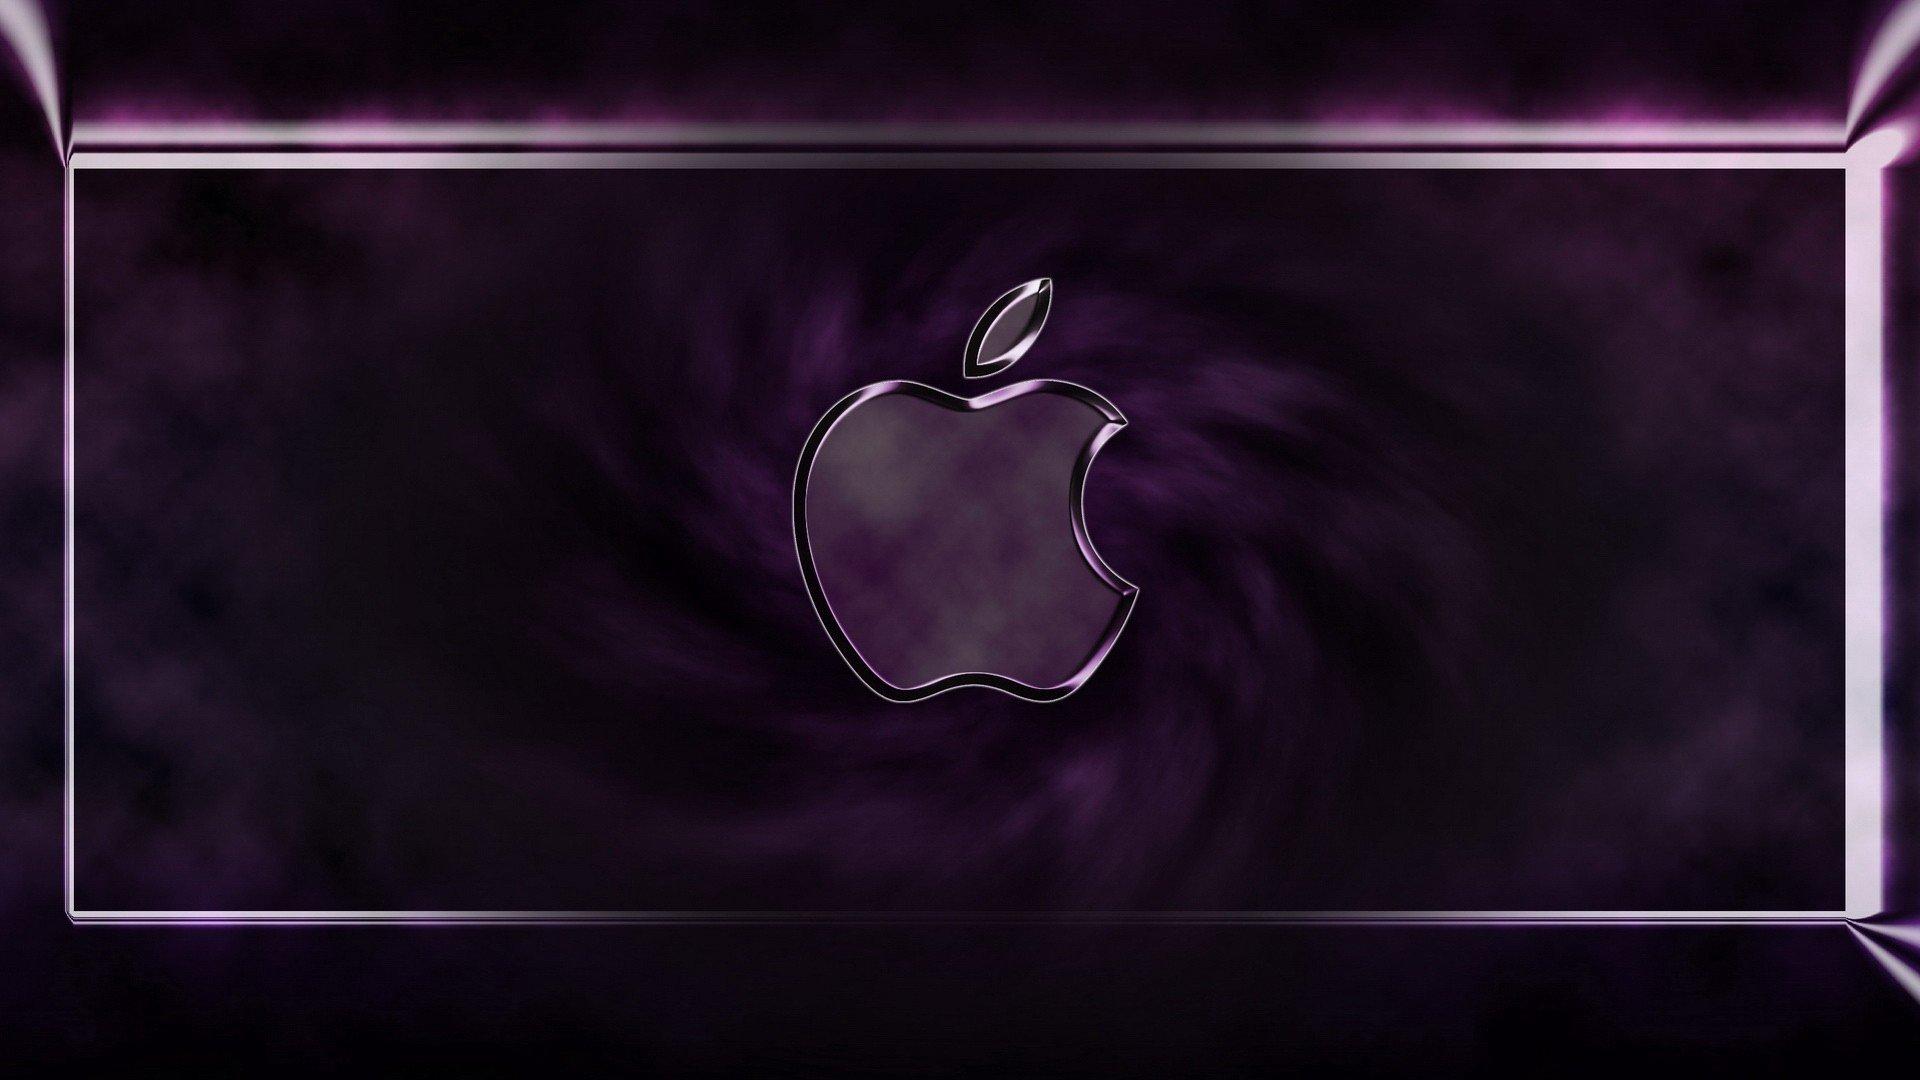 Free Download Apple Wallpaper Id 296376 Full Hd 1920x1080 For Pc